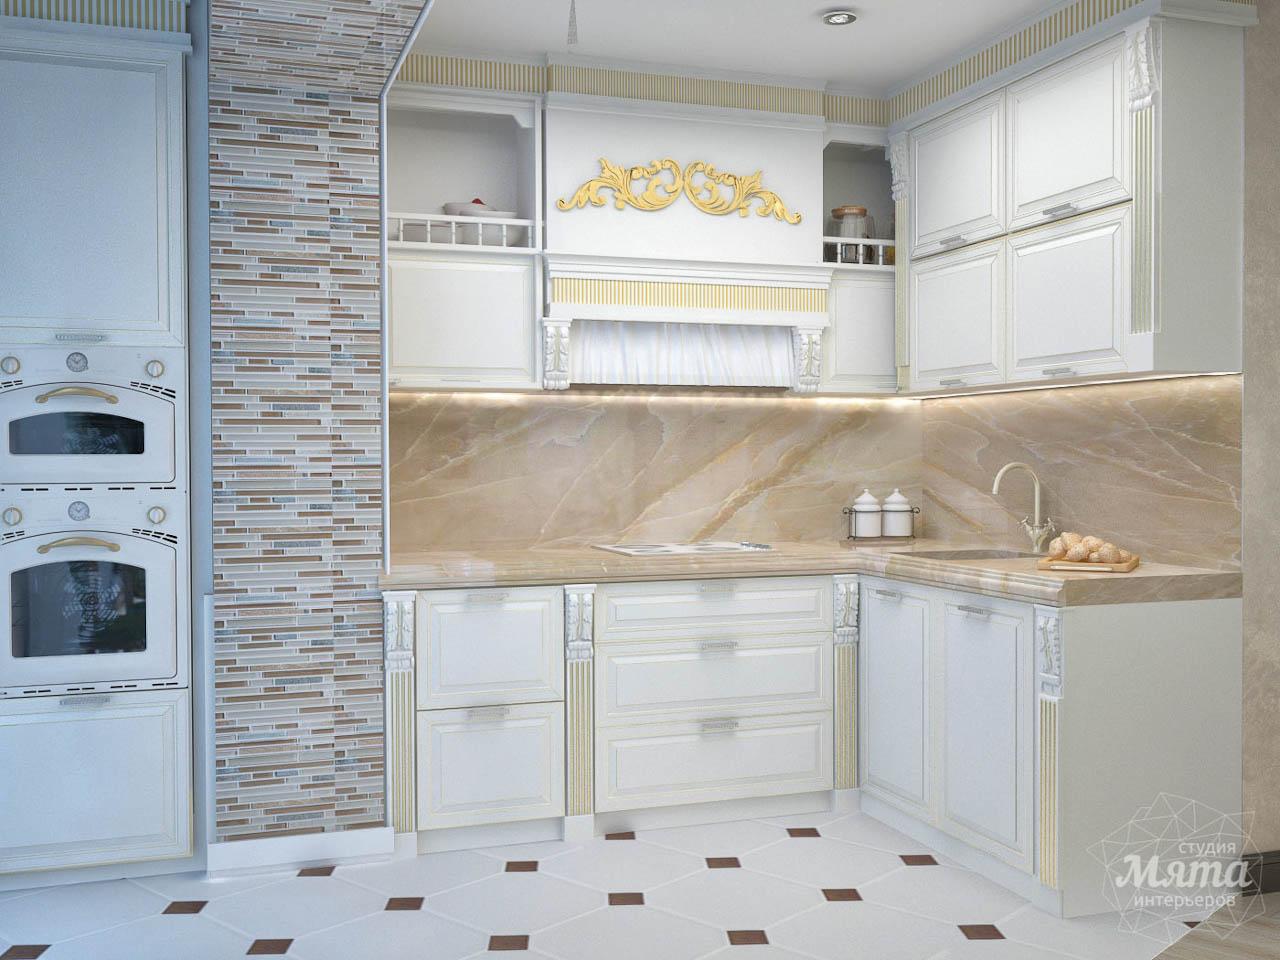 Дизайн интерьера и ремонт трехкомнатной квартиры по ул. 8 Марта 190 img996482756